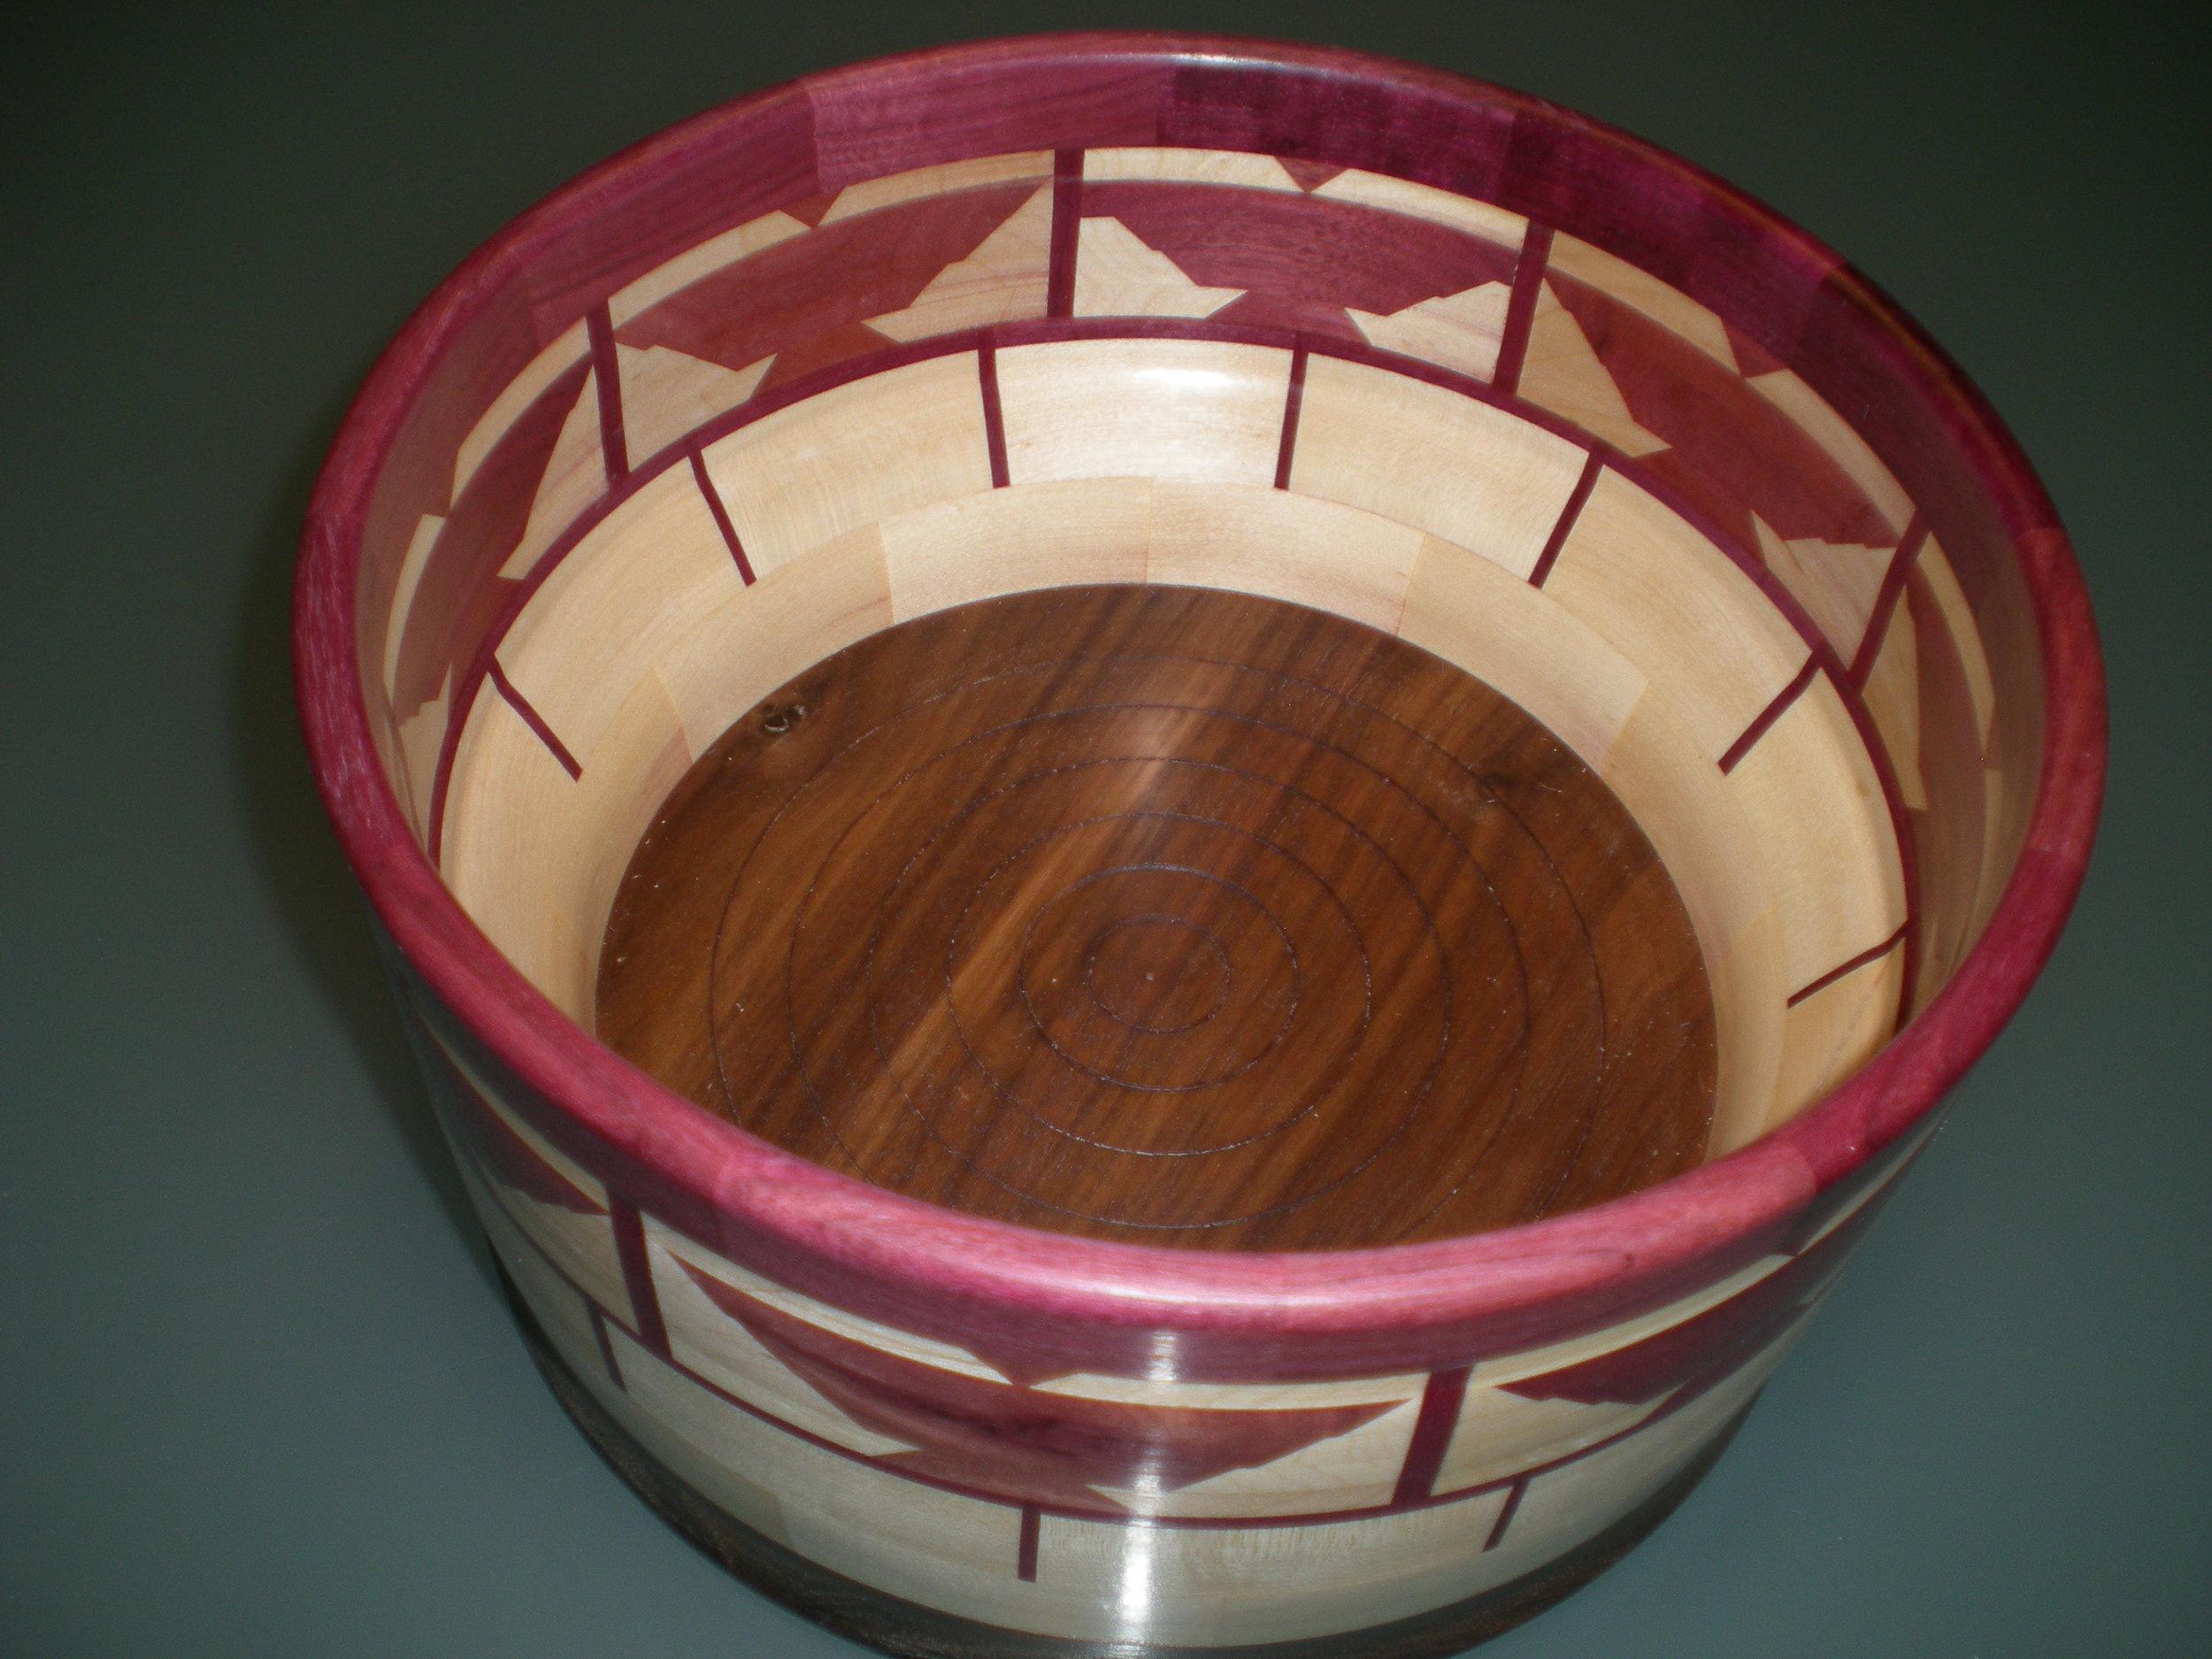 RJC Wood Creations - Bowls (32).JPG